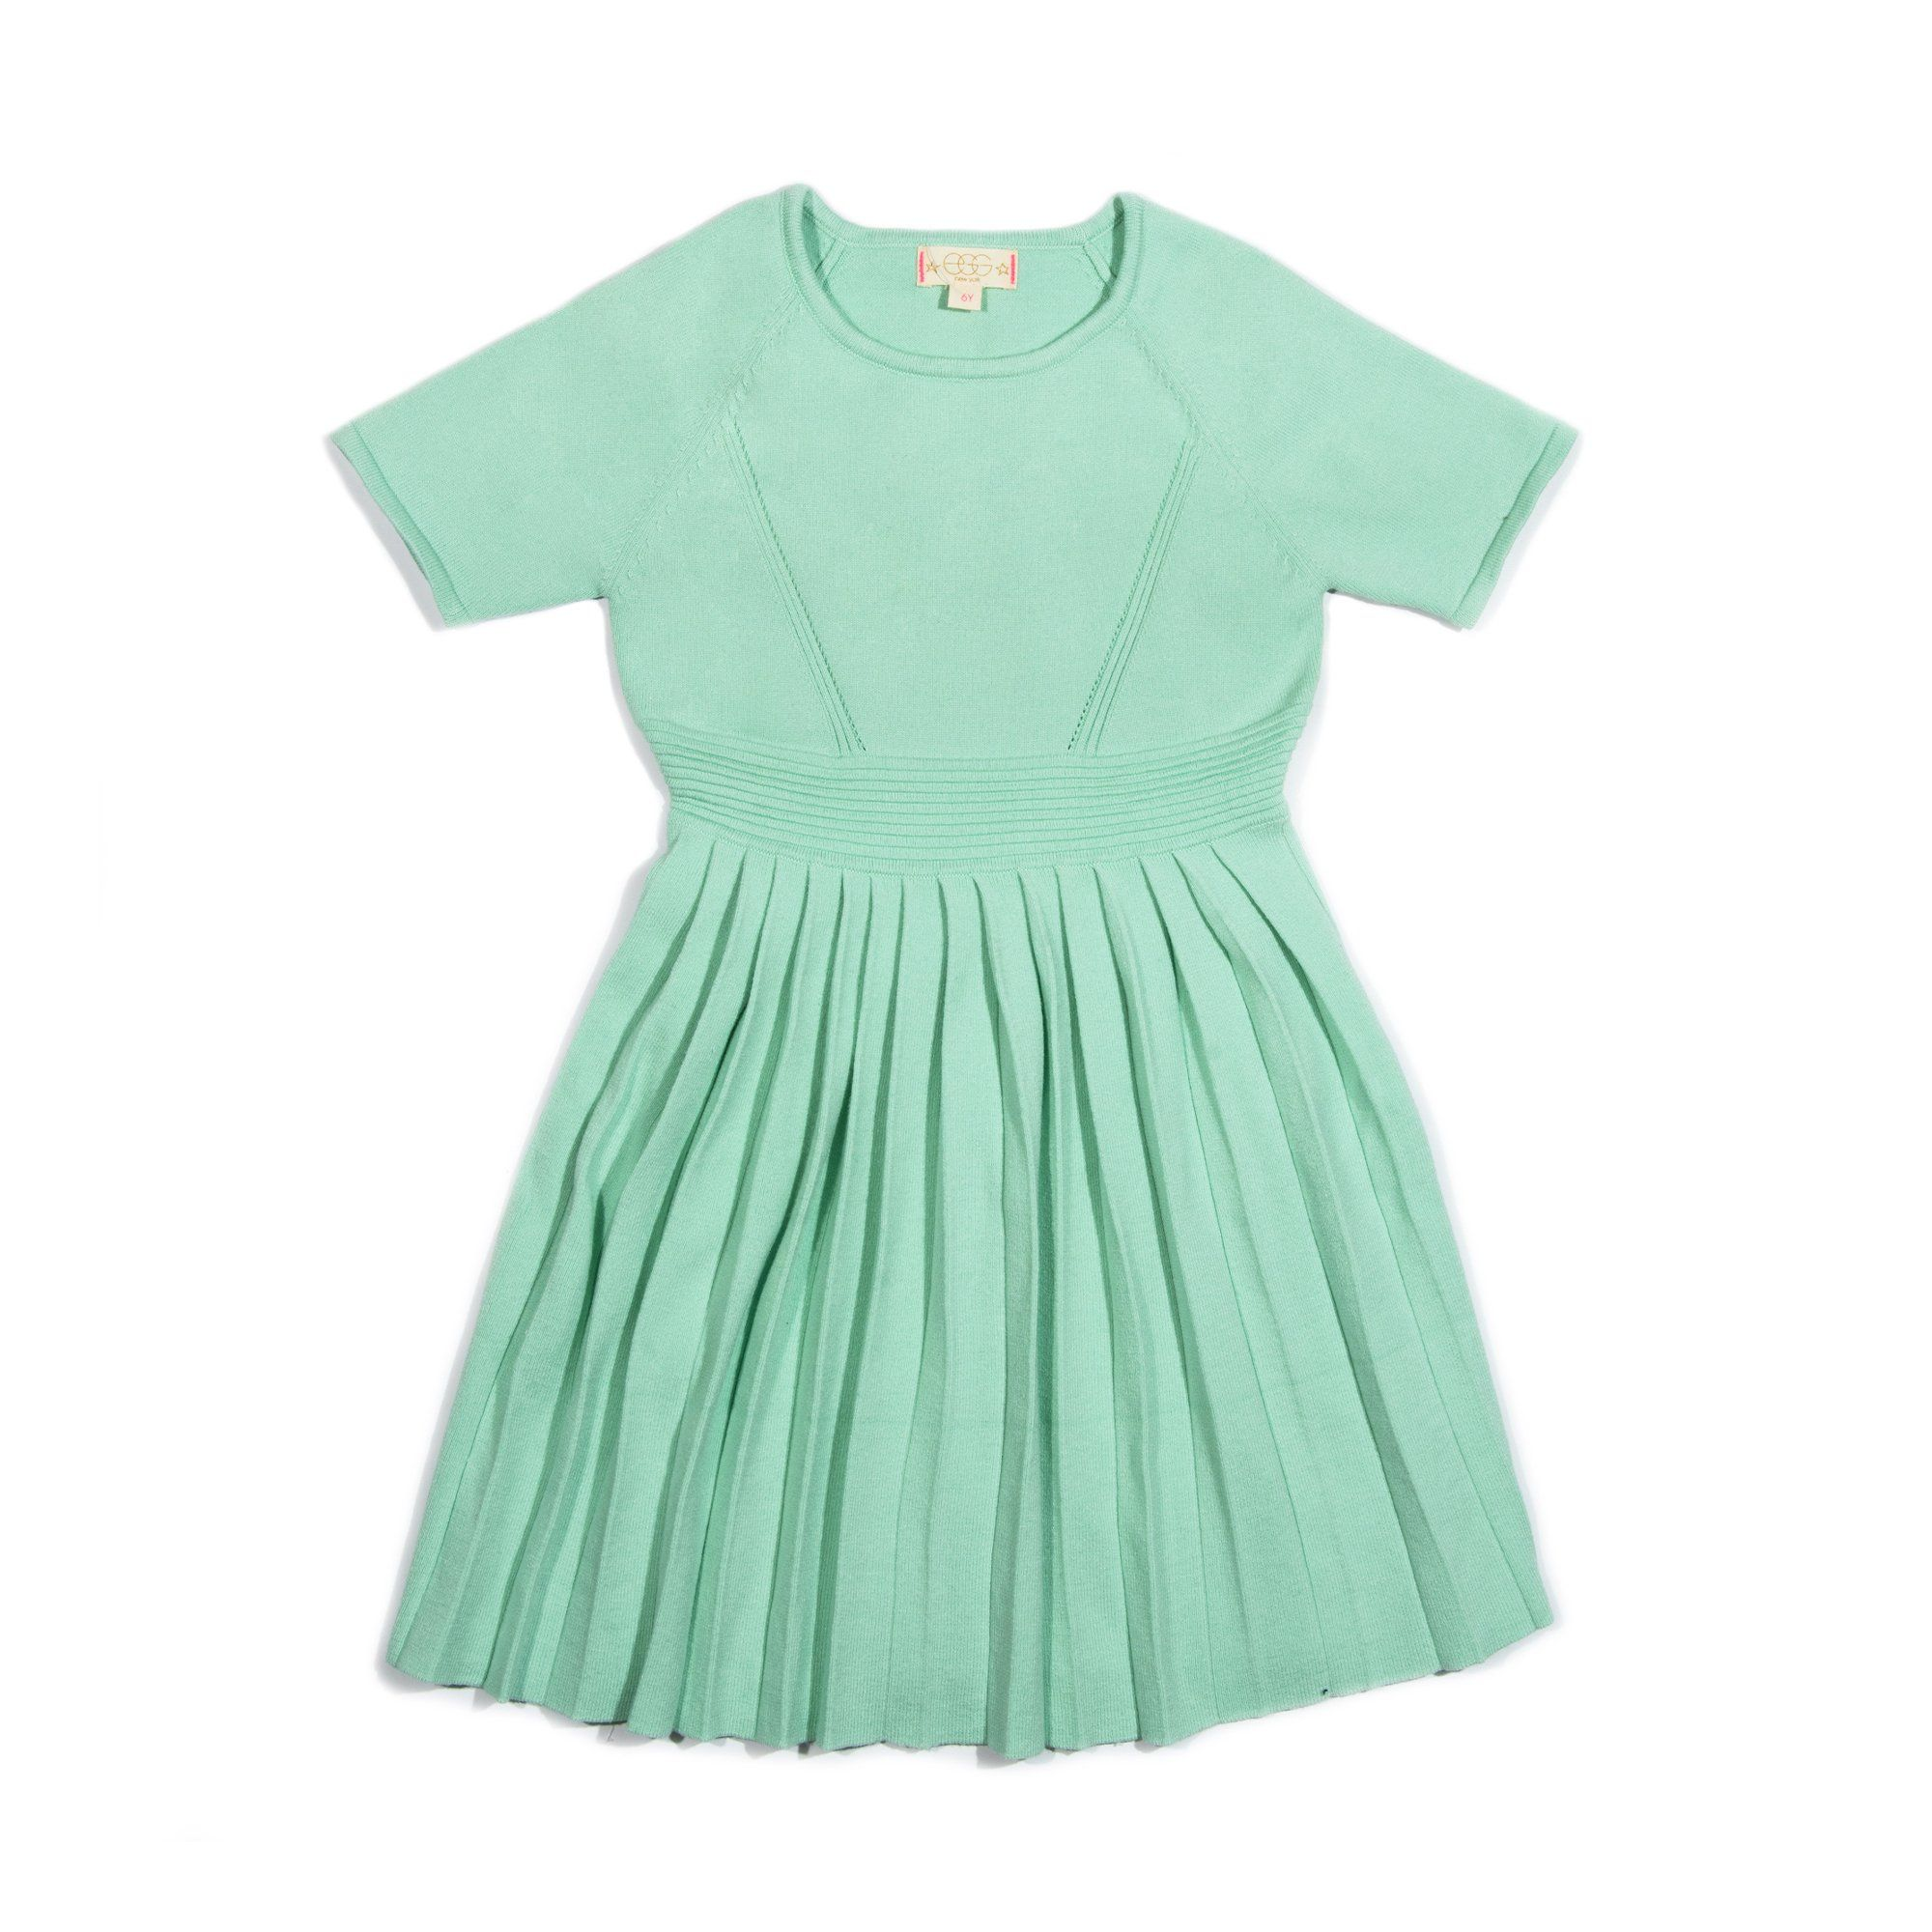 Zoe Sweater Dress - Aqua / 10Y